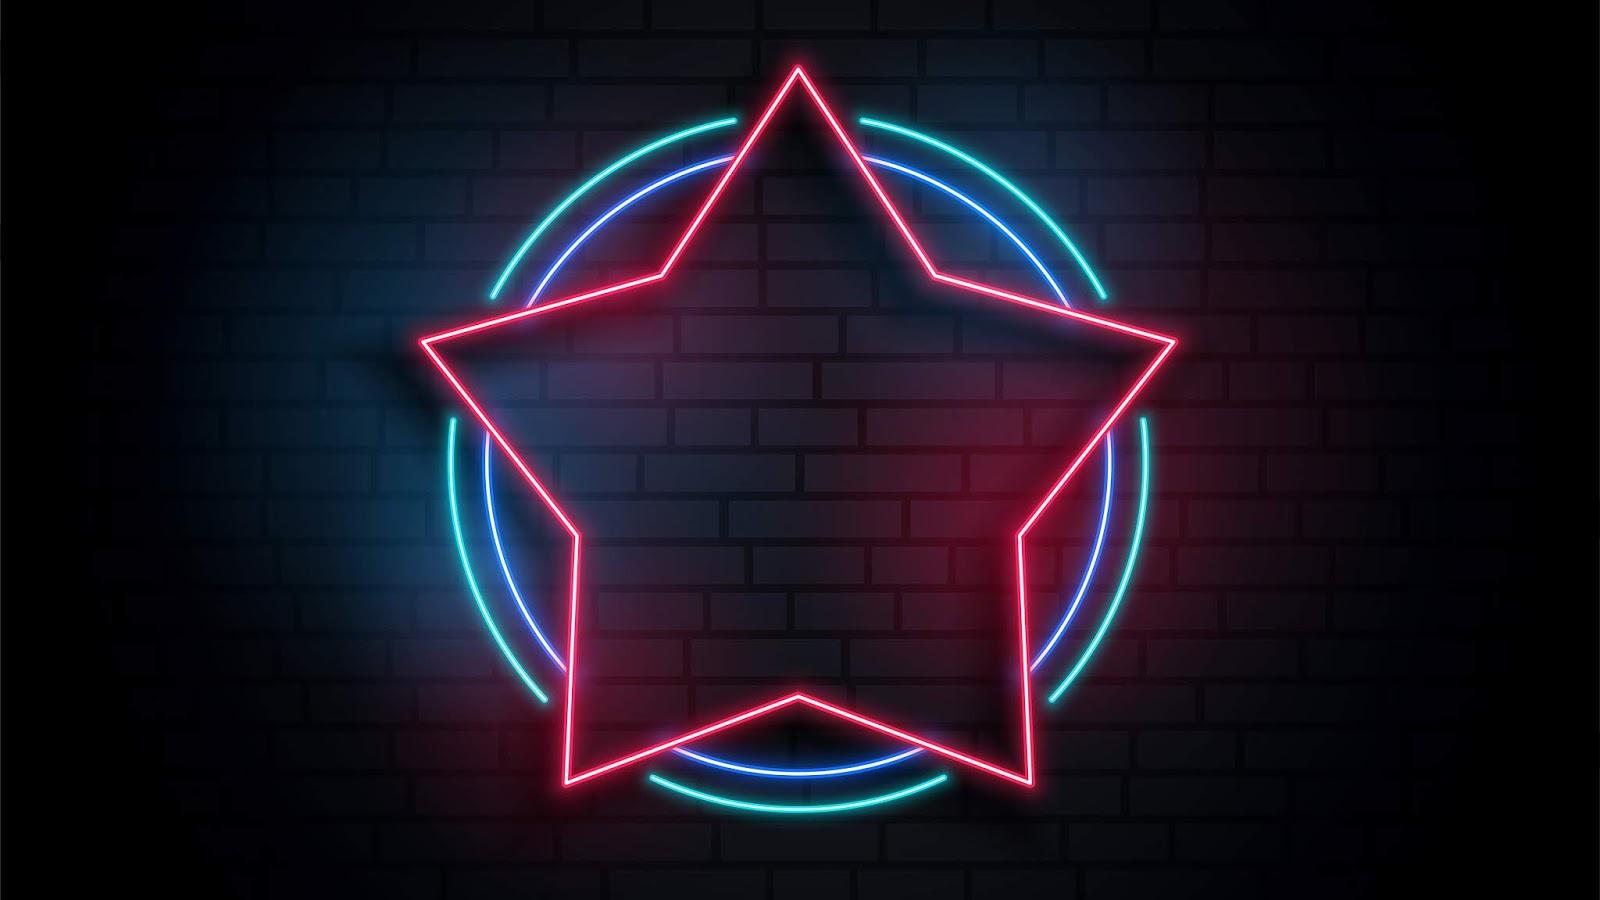 Desktop Wallpaper In 4k Neon Star Heroscreen Cool Wallpapers